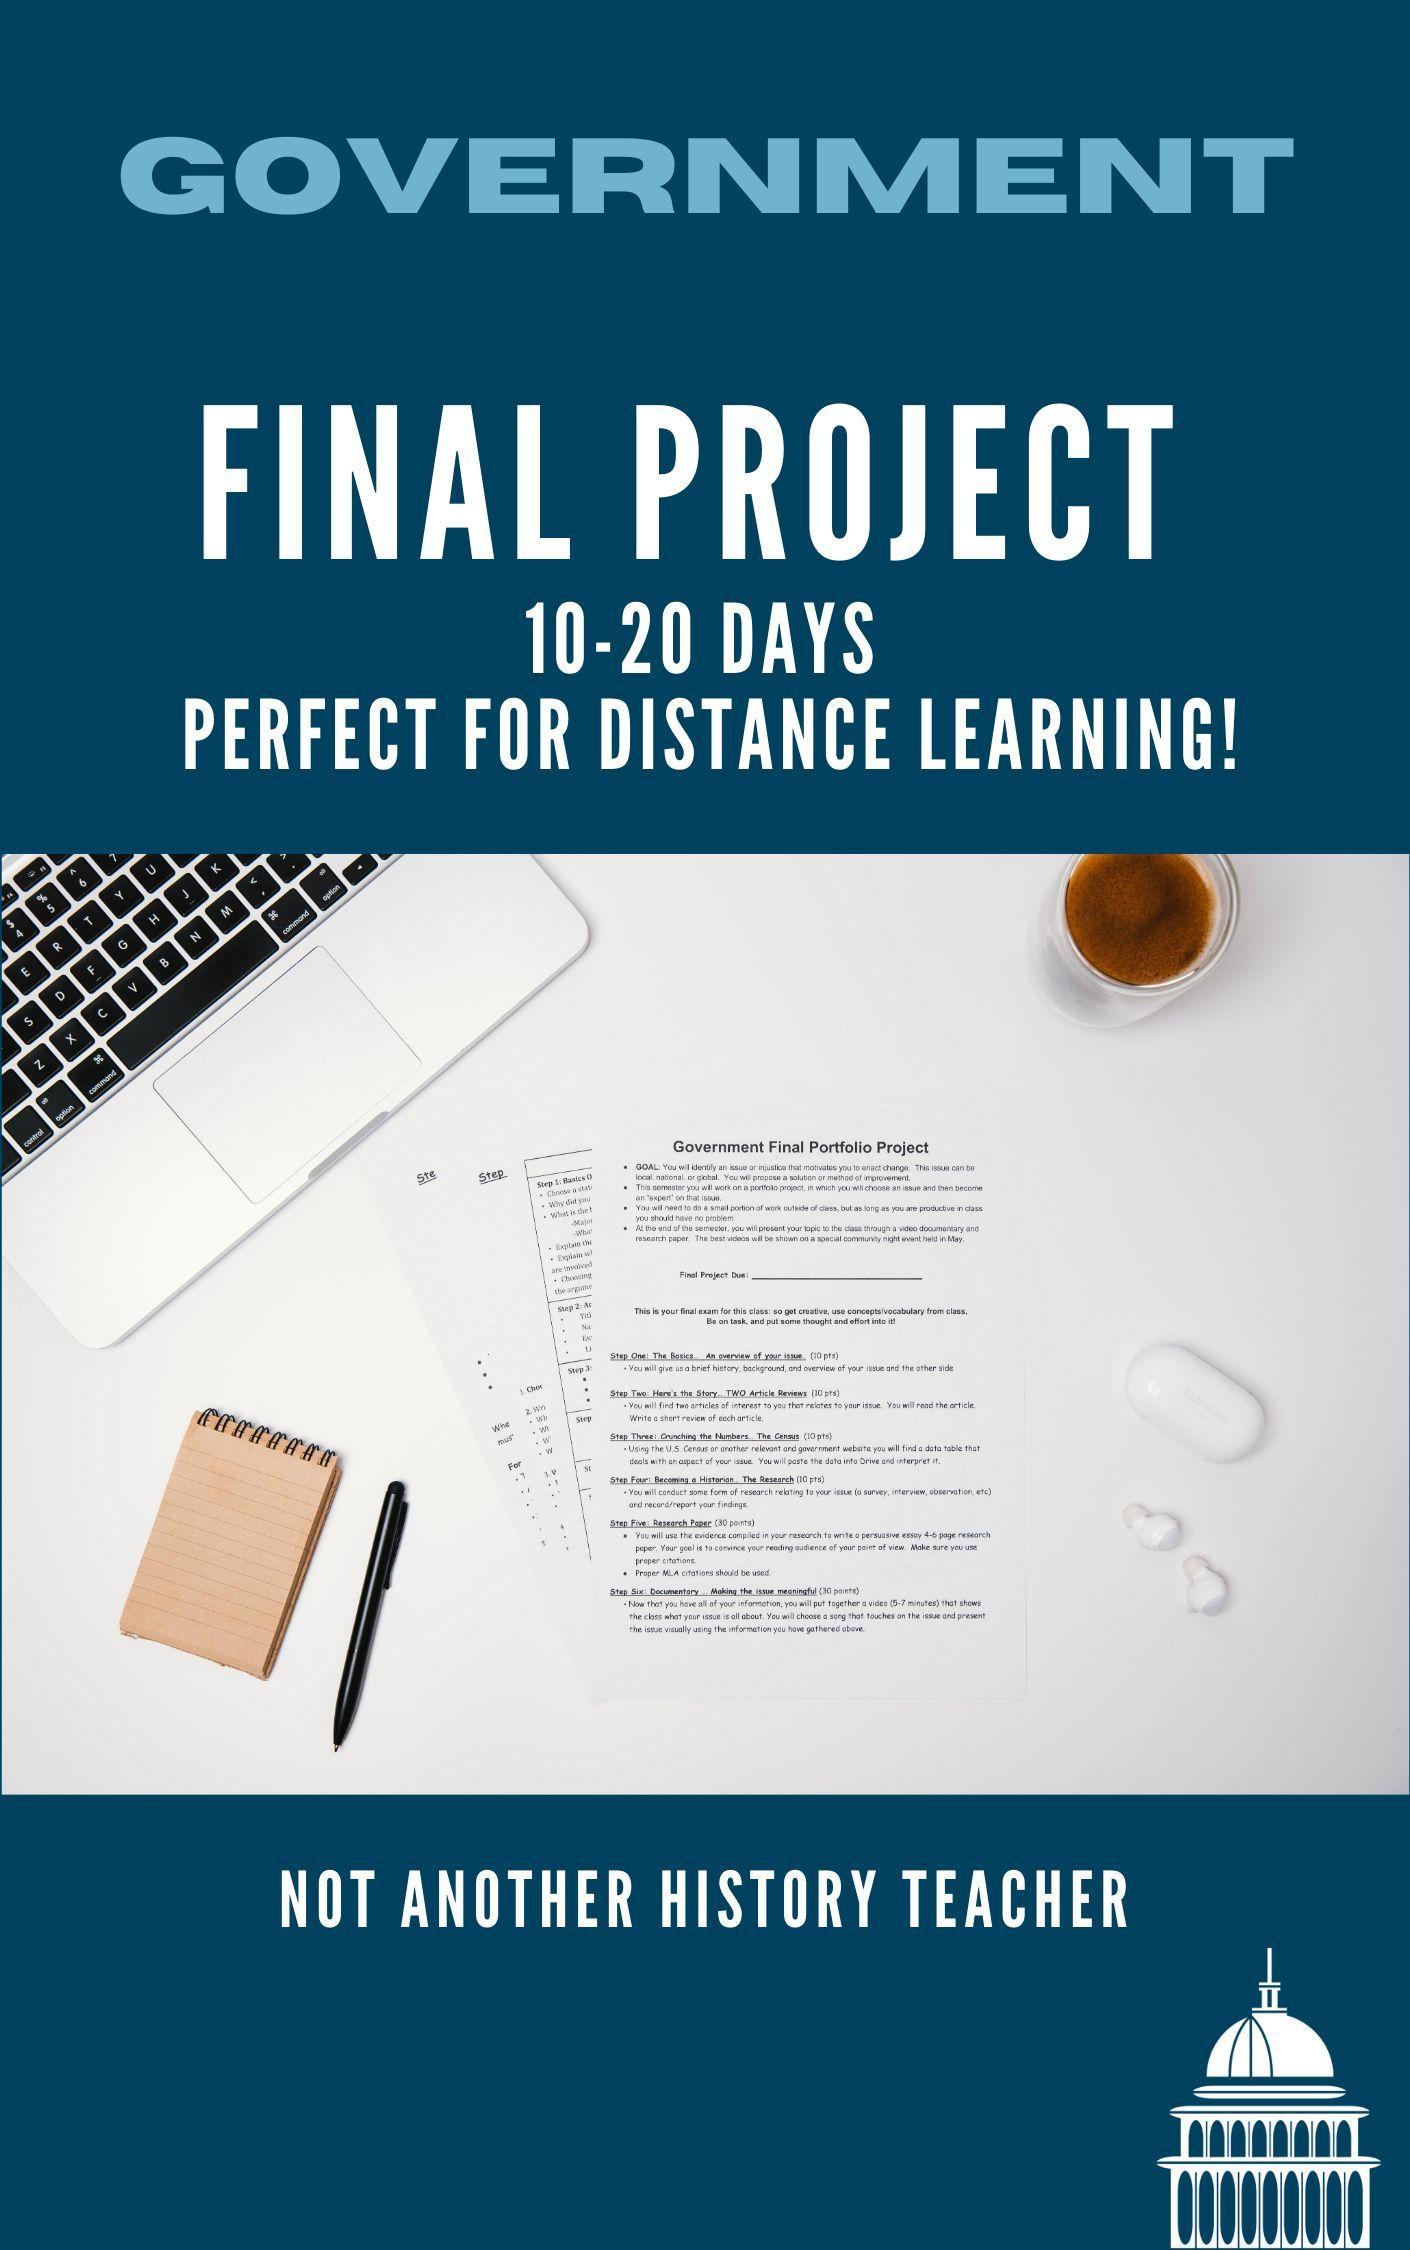 Government Final Project Not Another History Teacher Social Studies Teaching Strategies High School Social Studies High School Social Studies Teacher [ 2250 x 1410 Pixel ]